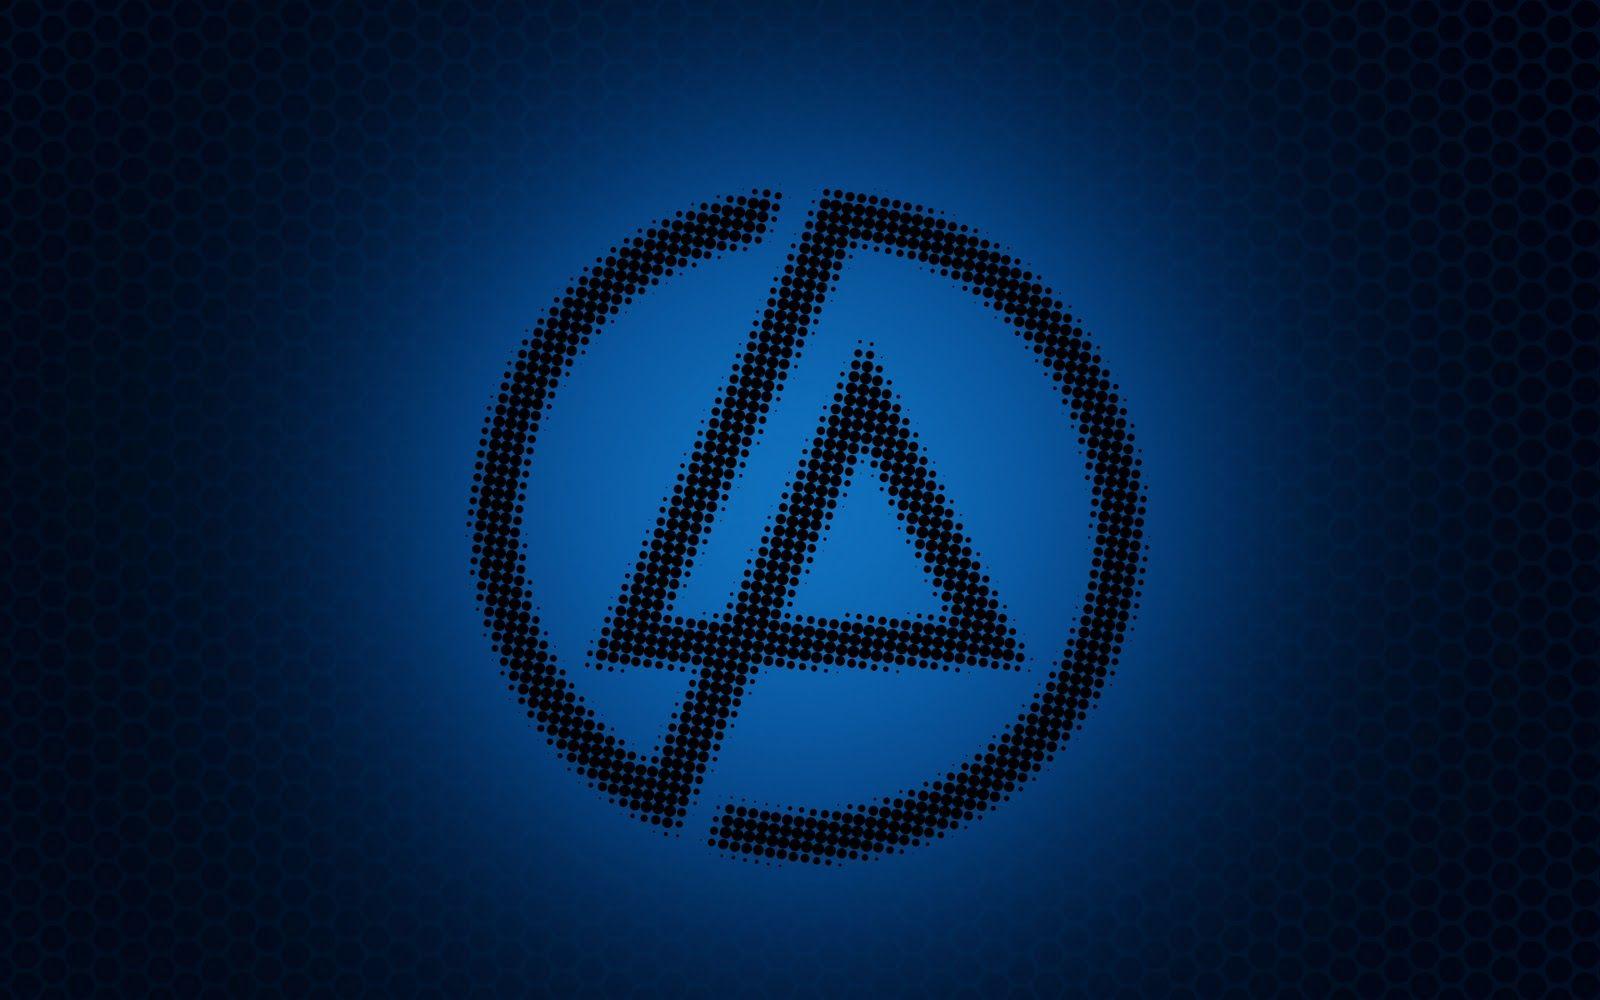 Linkin Park Google Search Linkin Park Wallpaper Linkin Park Linkin Park Logo